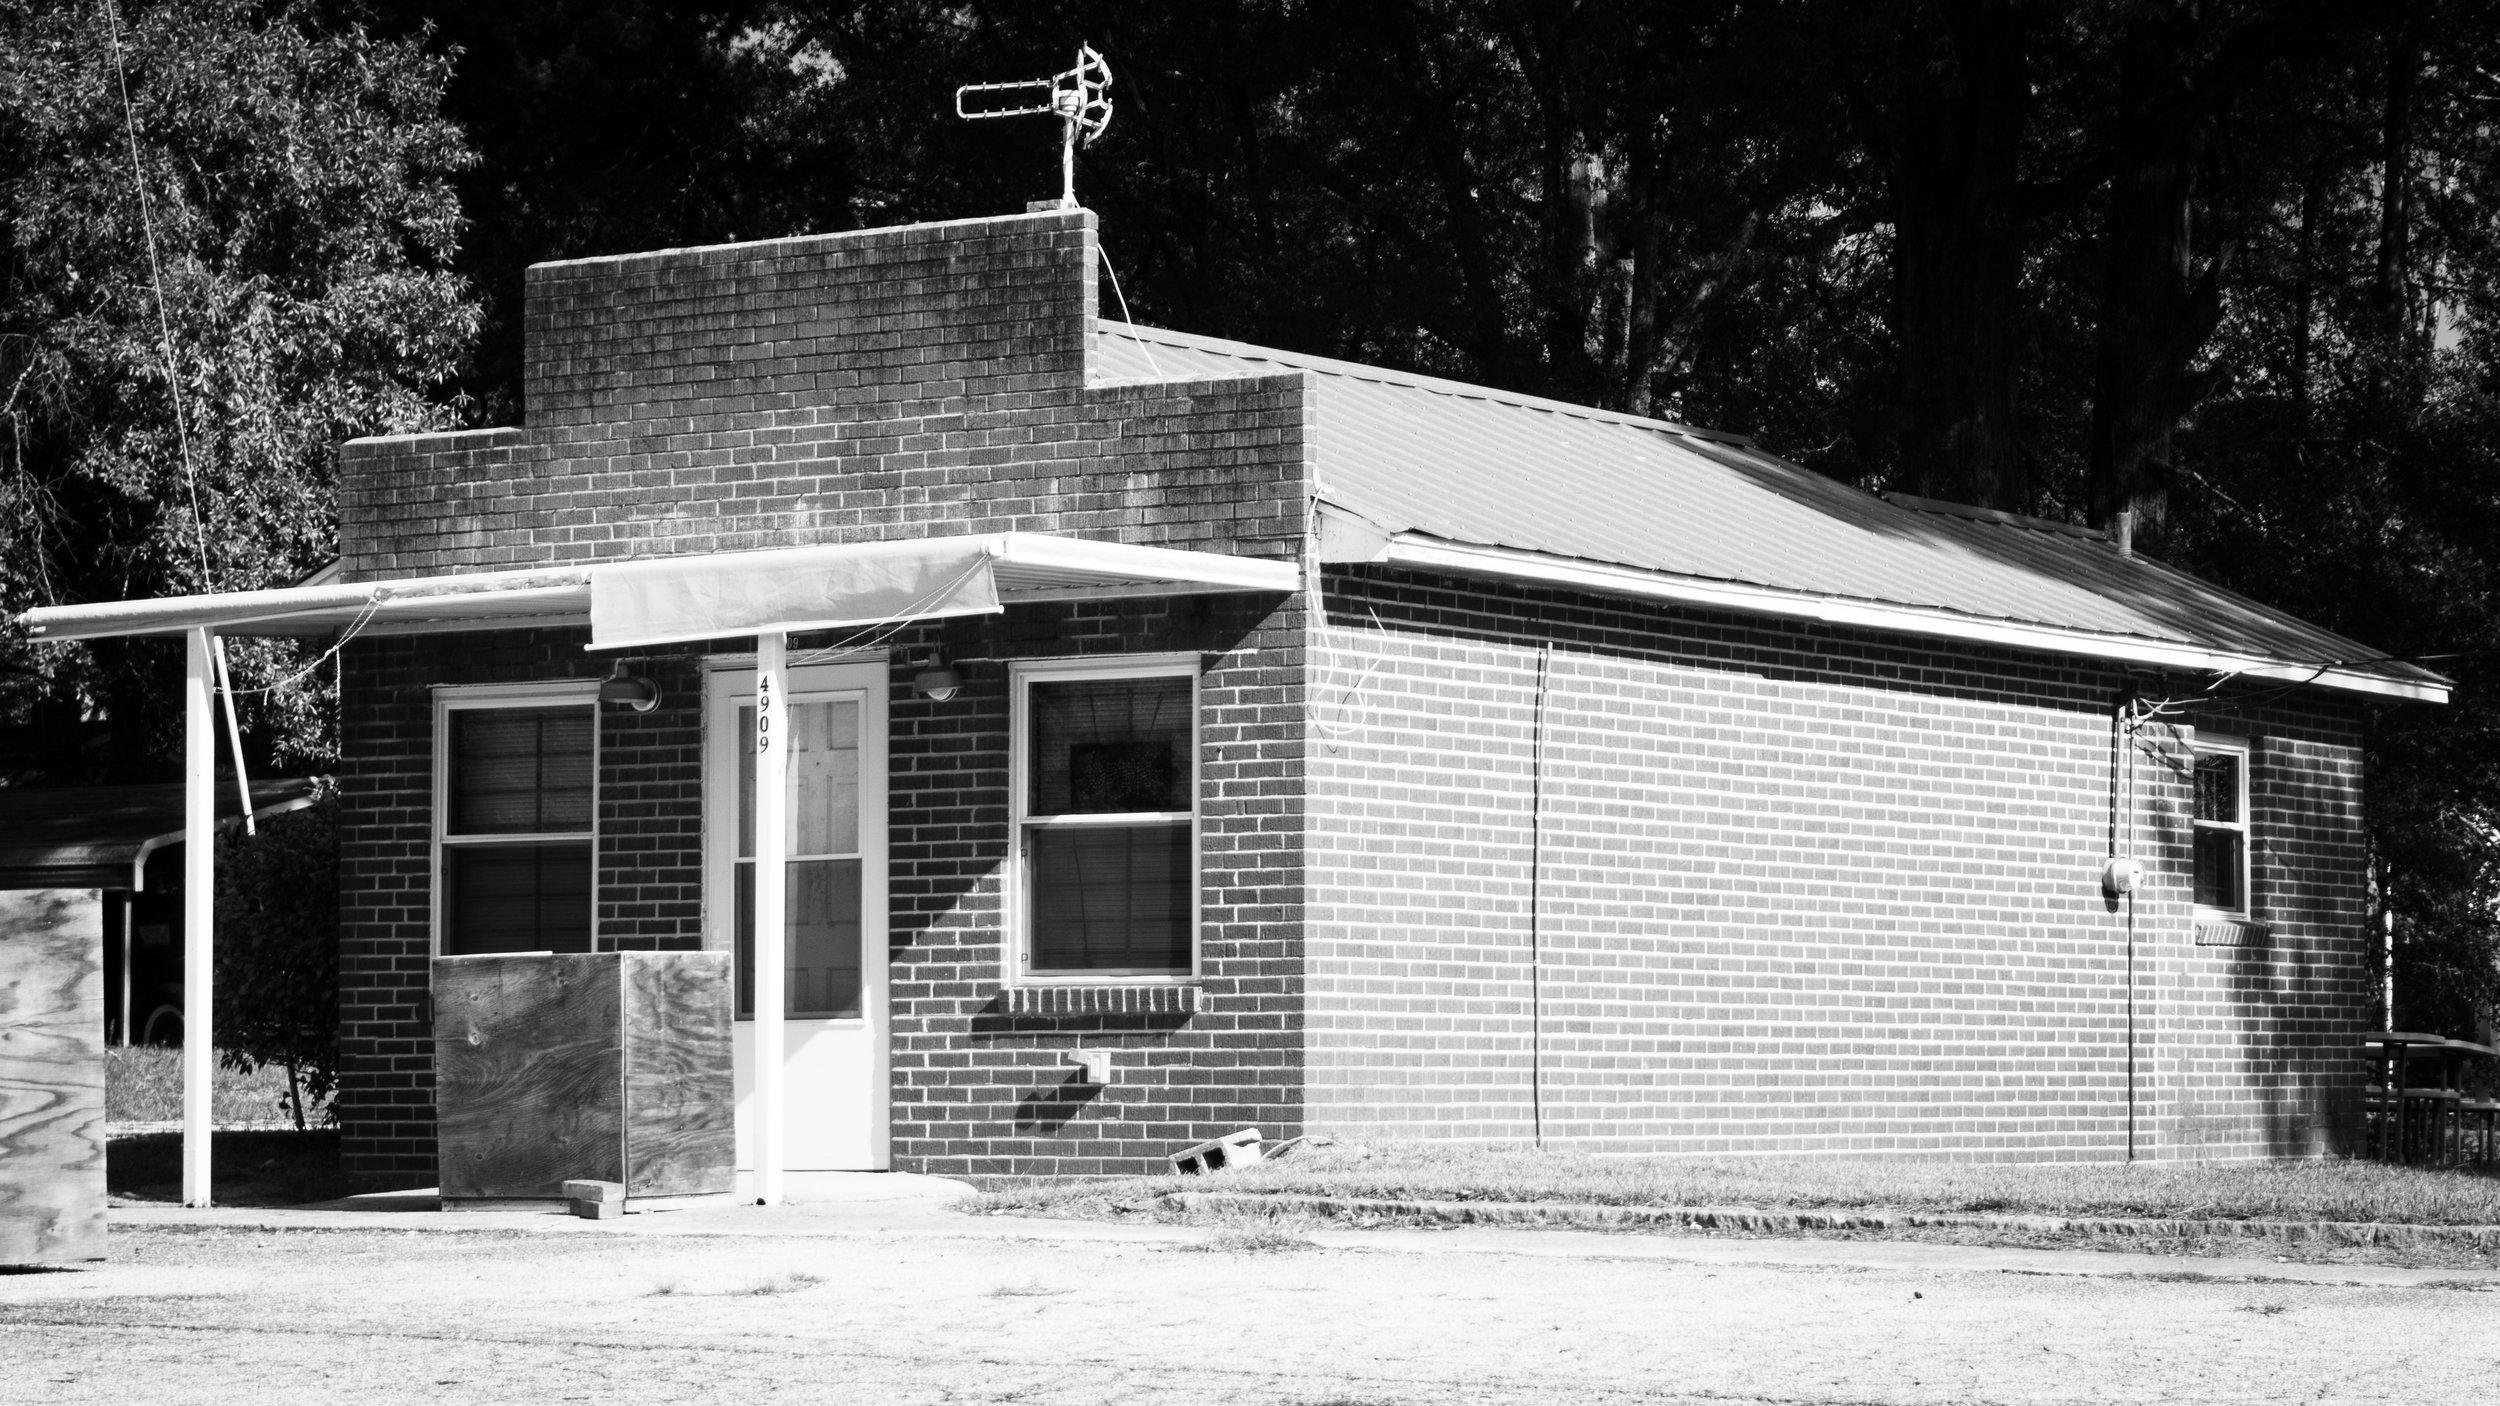 Bradley, SC Post Office (Closed)